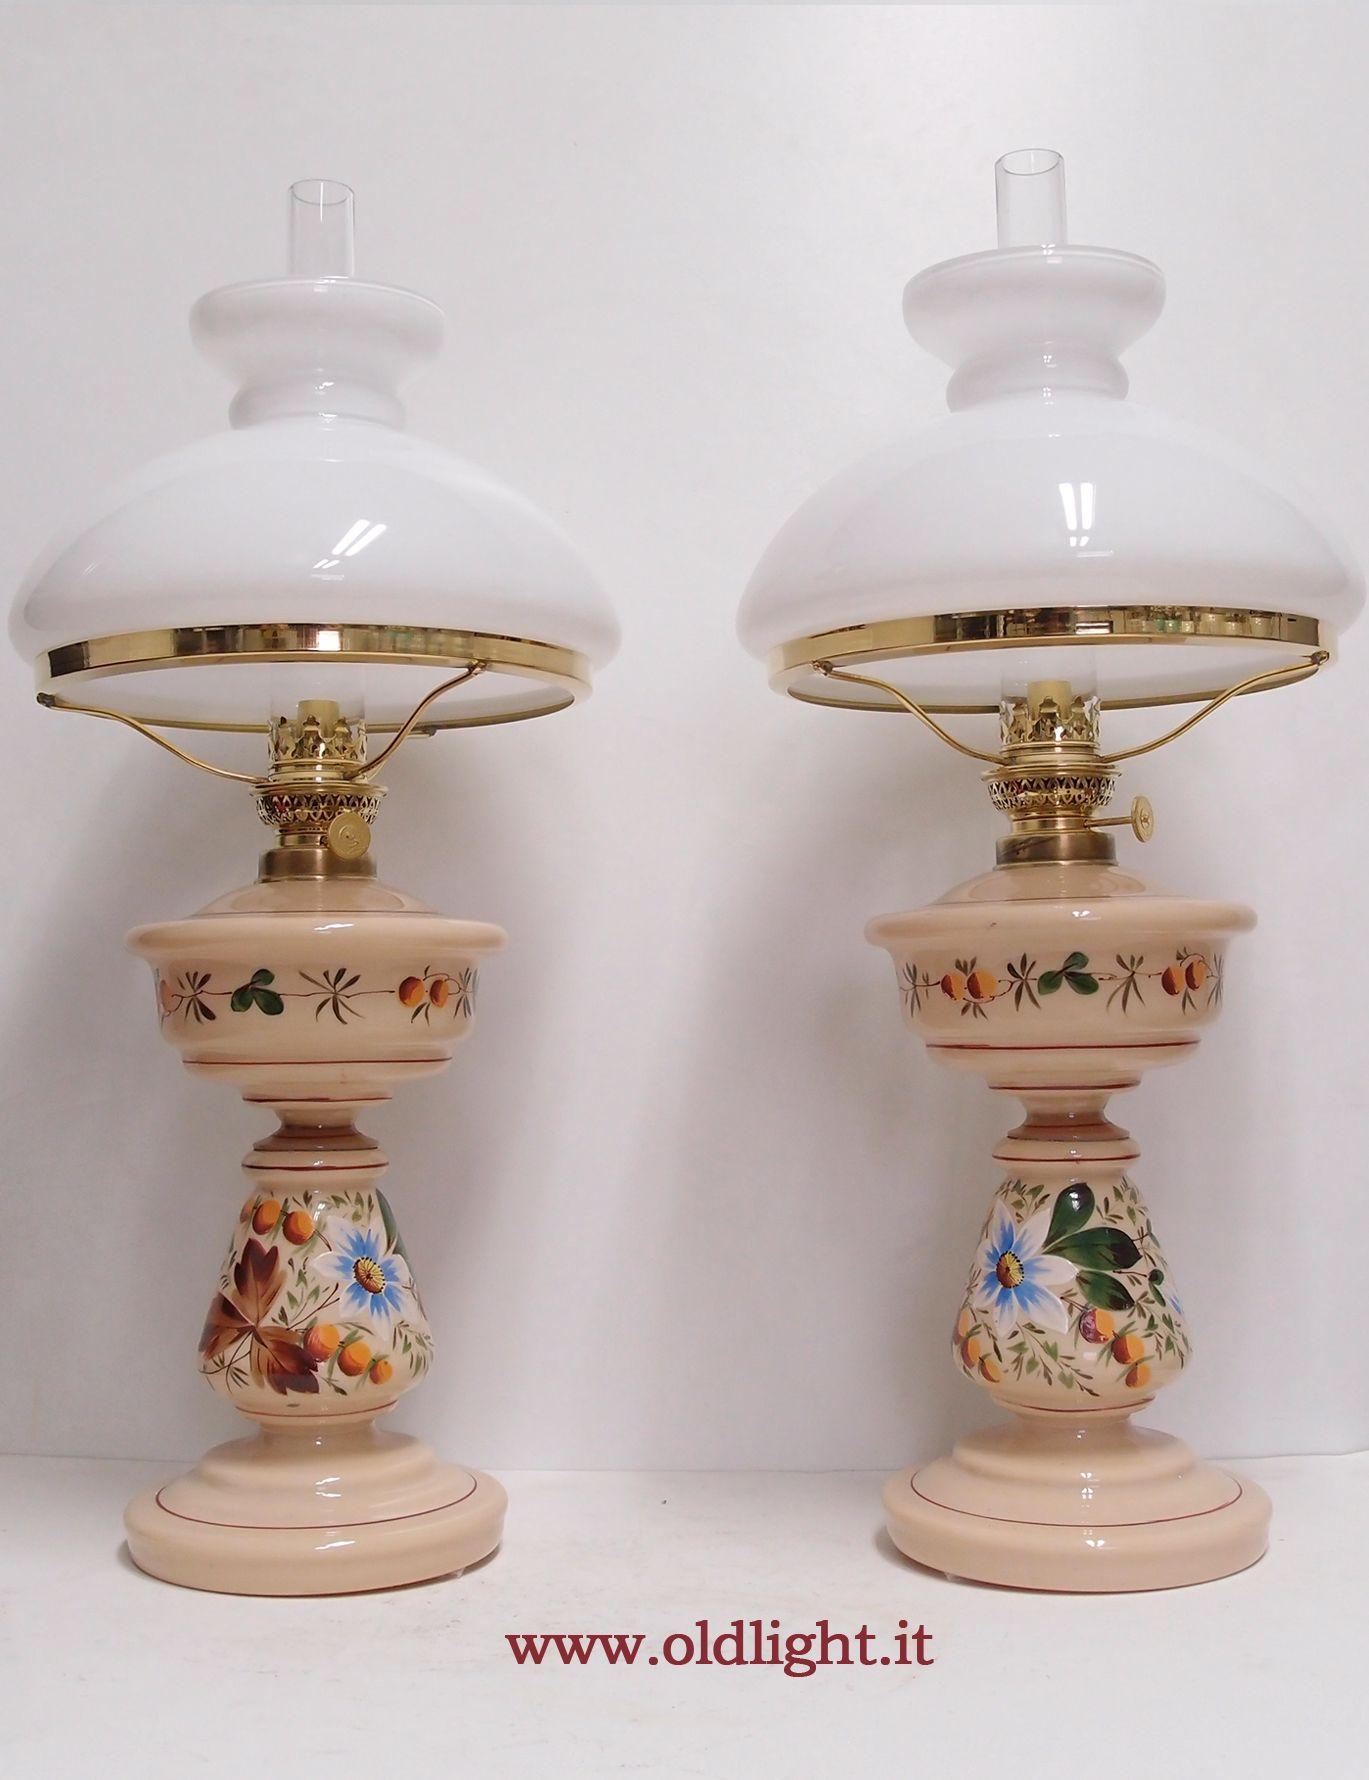 Bellissima, rara ed integra coppia di lampade ( originali